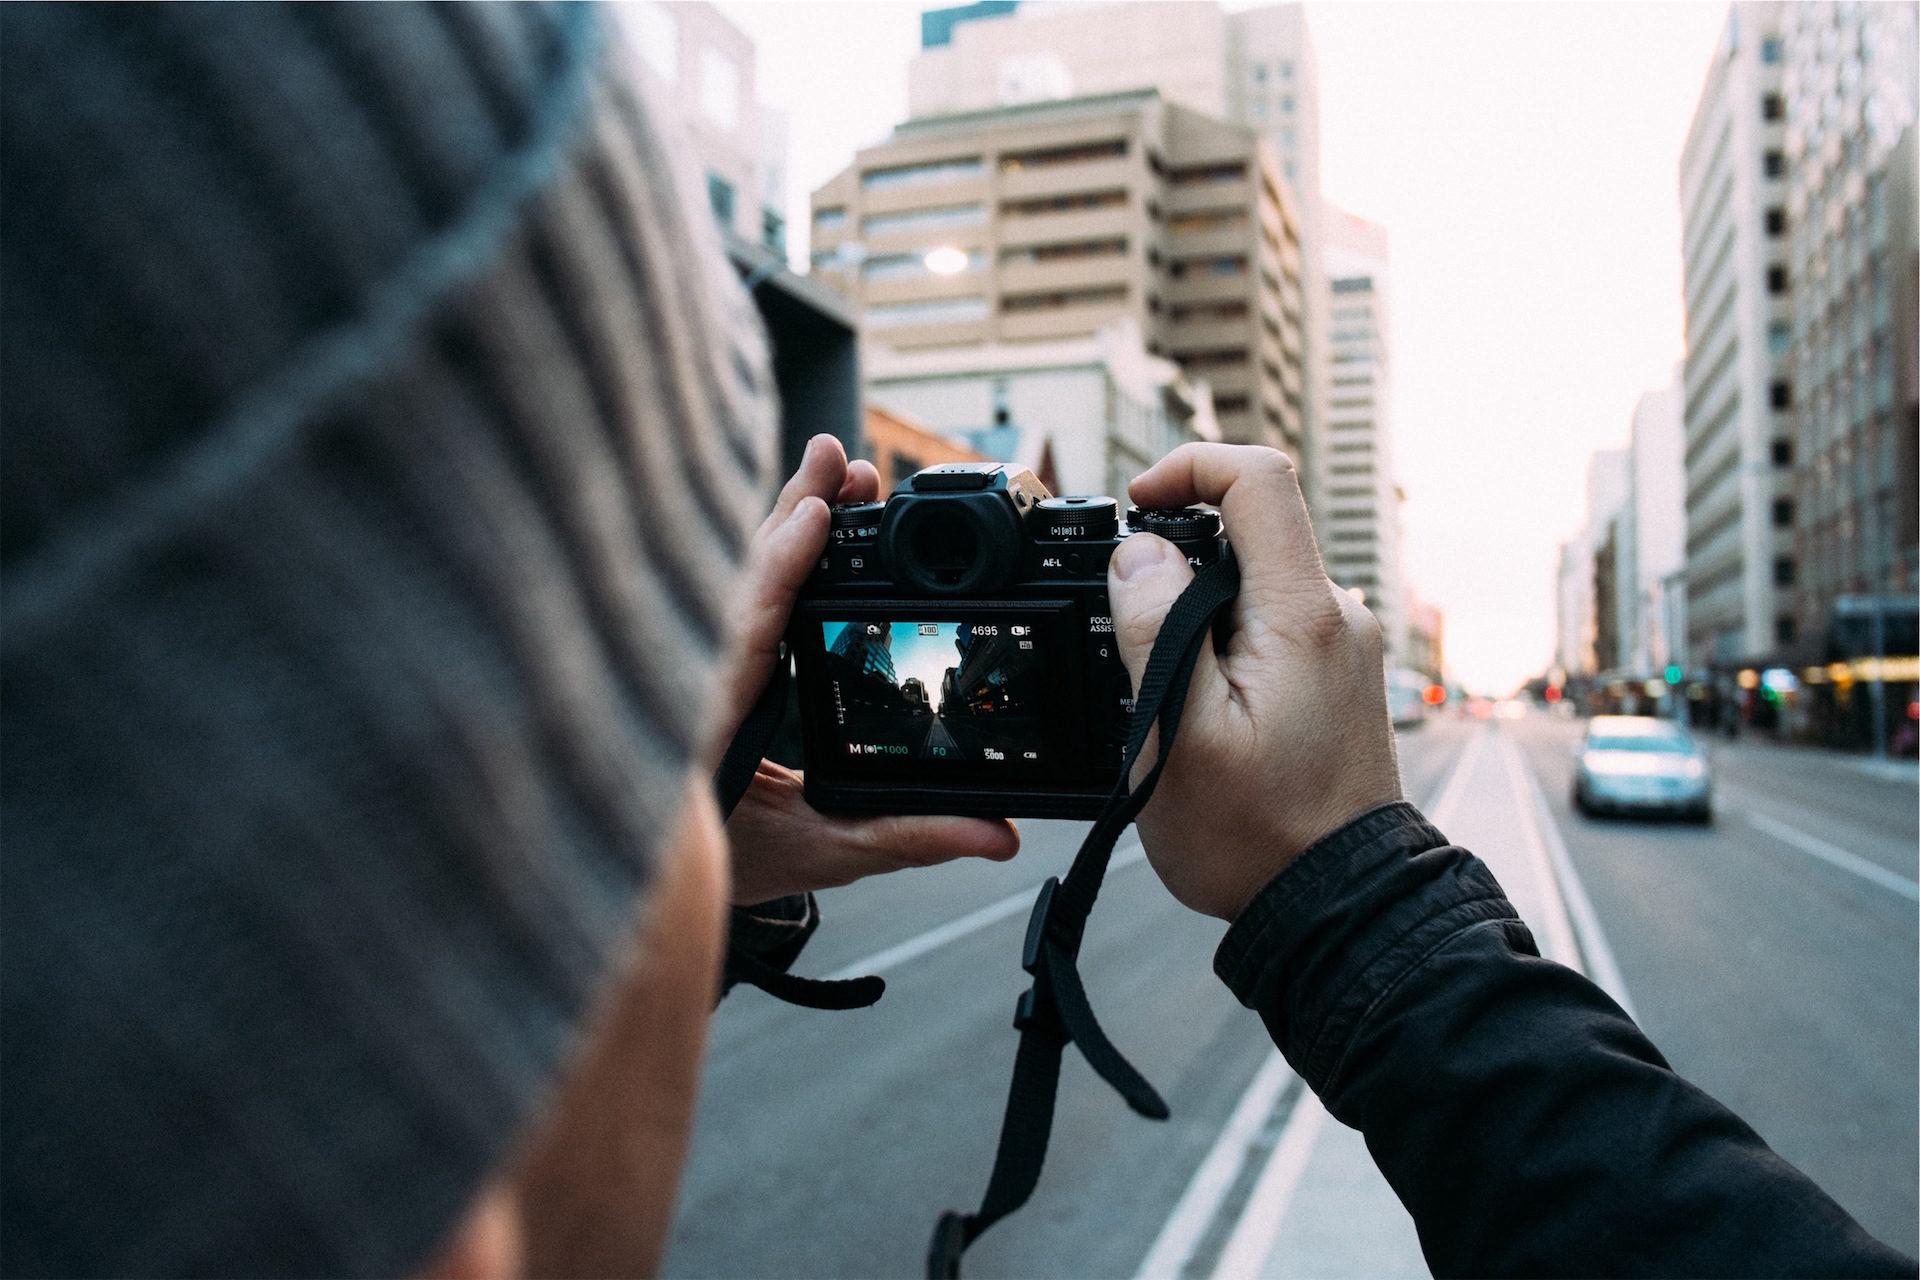 शहर, आदमी, कैमरा, फोटोग्राफी, पर्यटन - HD वॉलपेपर - प्रोफेसर-falken.com